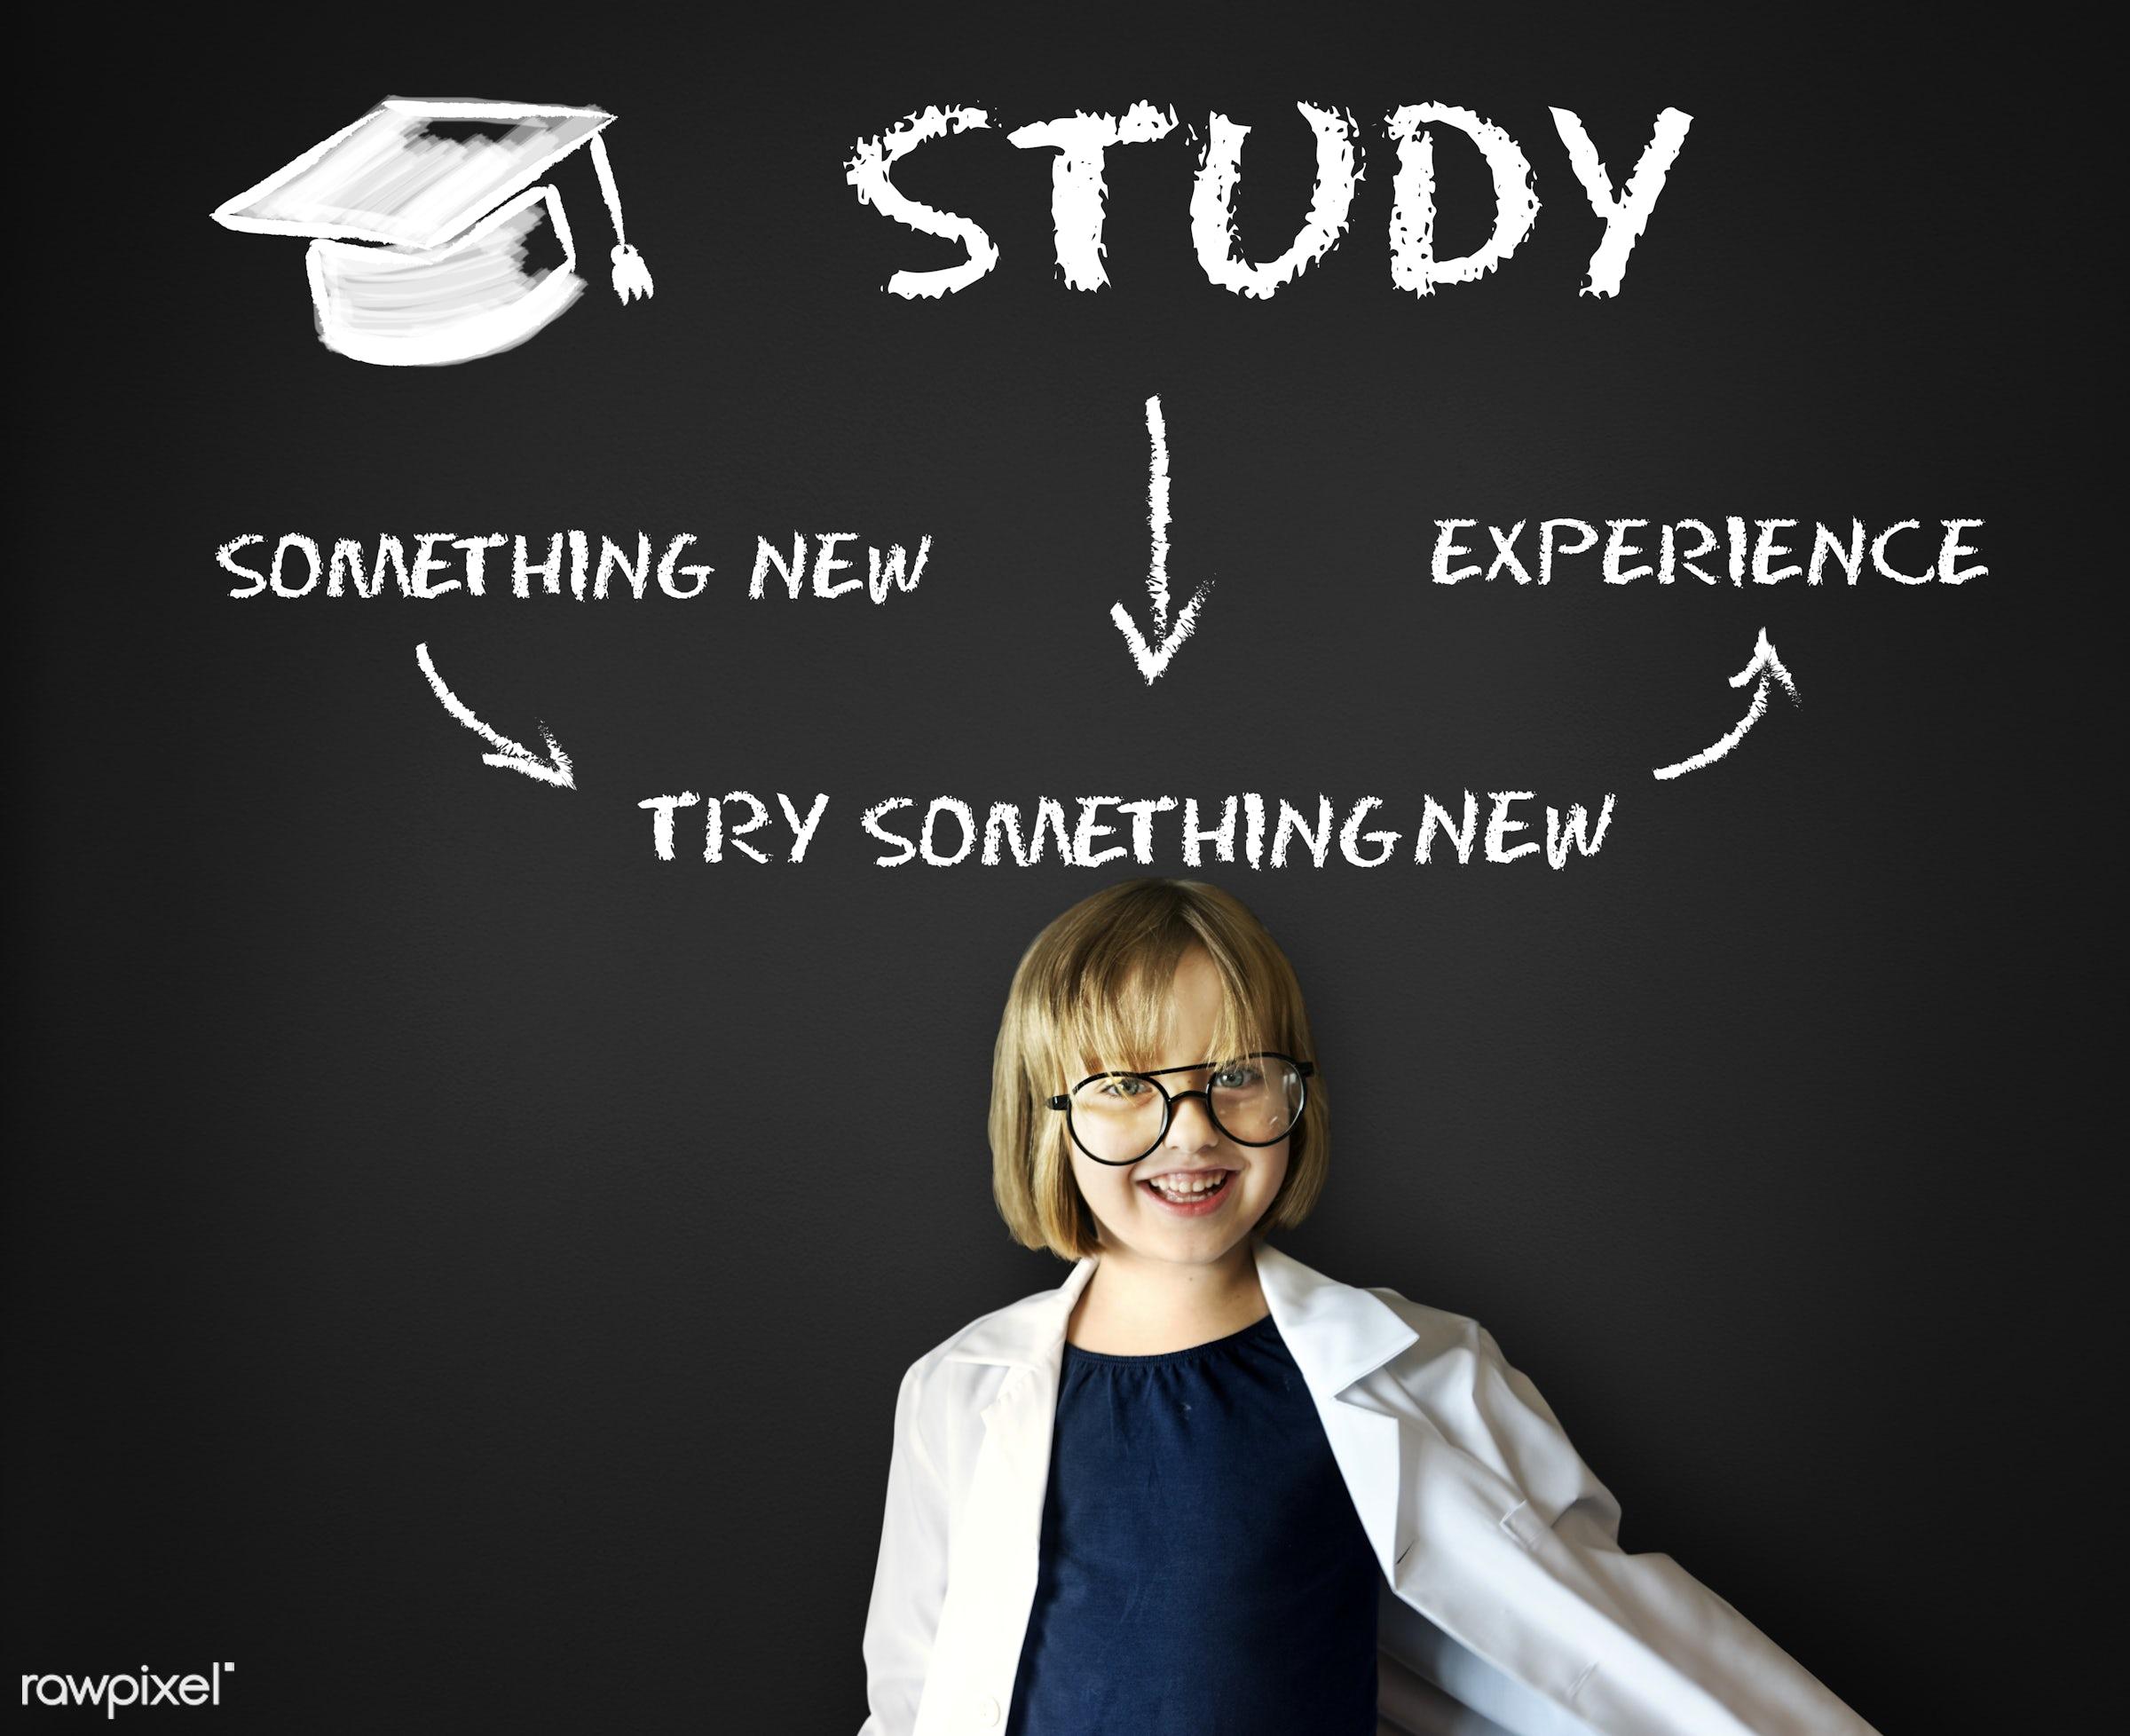 academic, adorable, blackboard, cheerful, child, childhood, cute, dream job, education, elementary age, experience, explore...